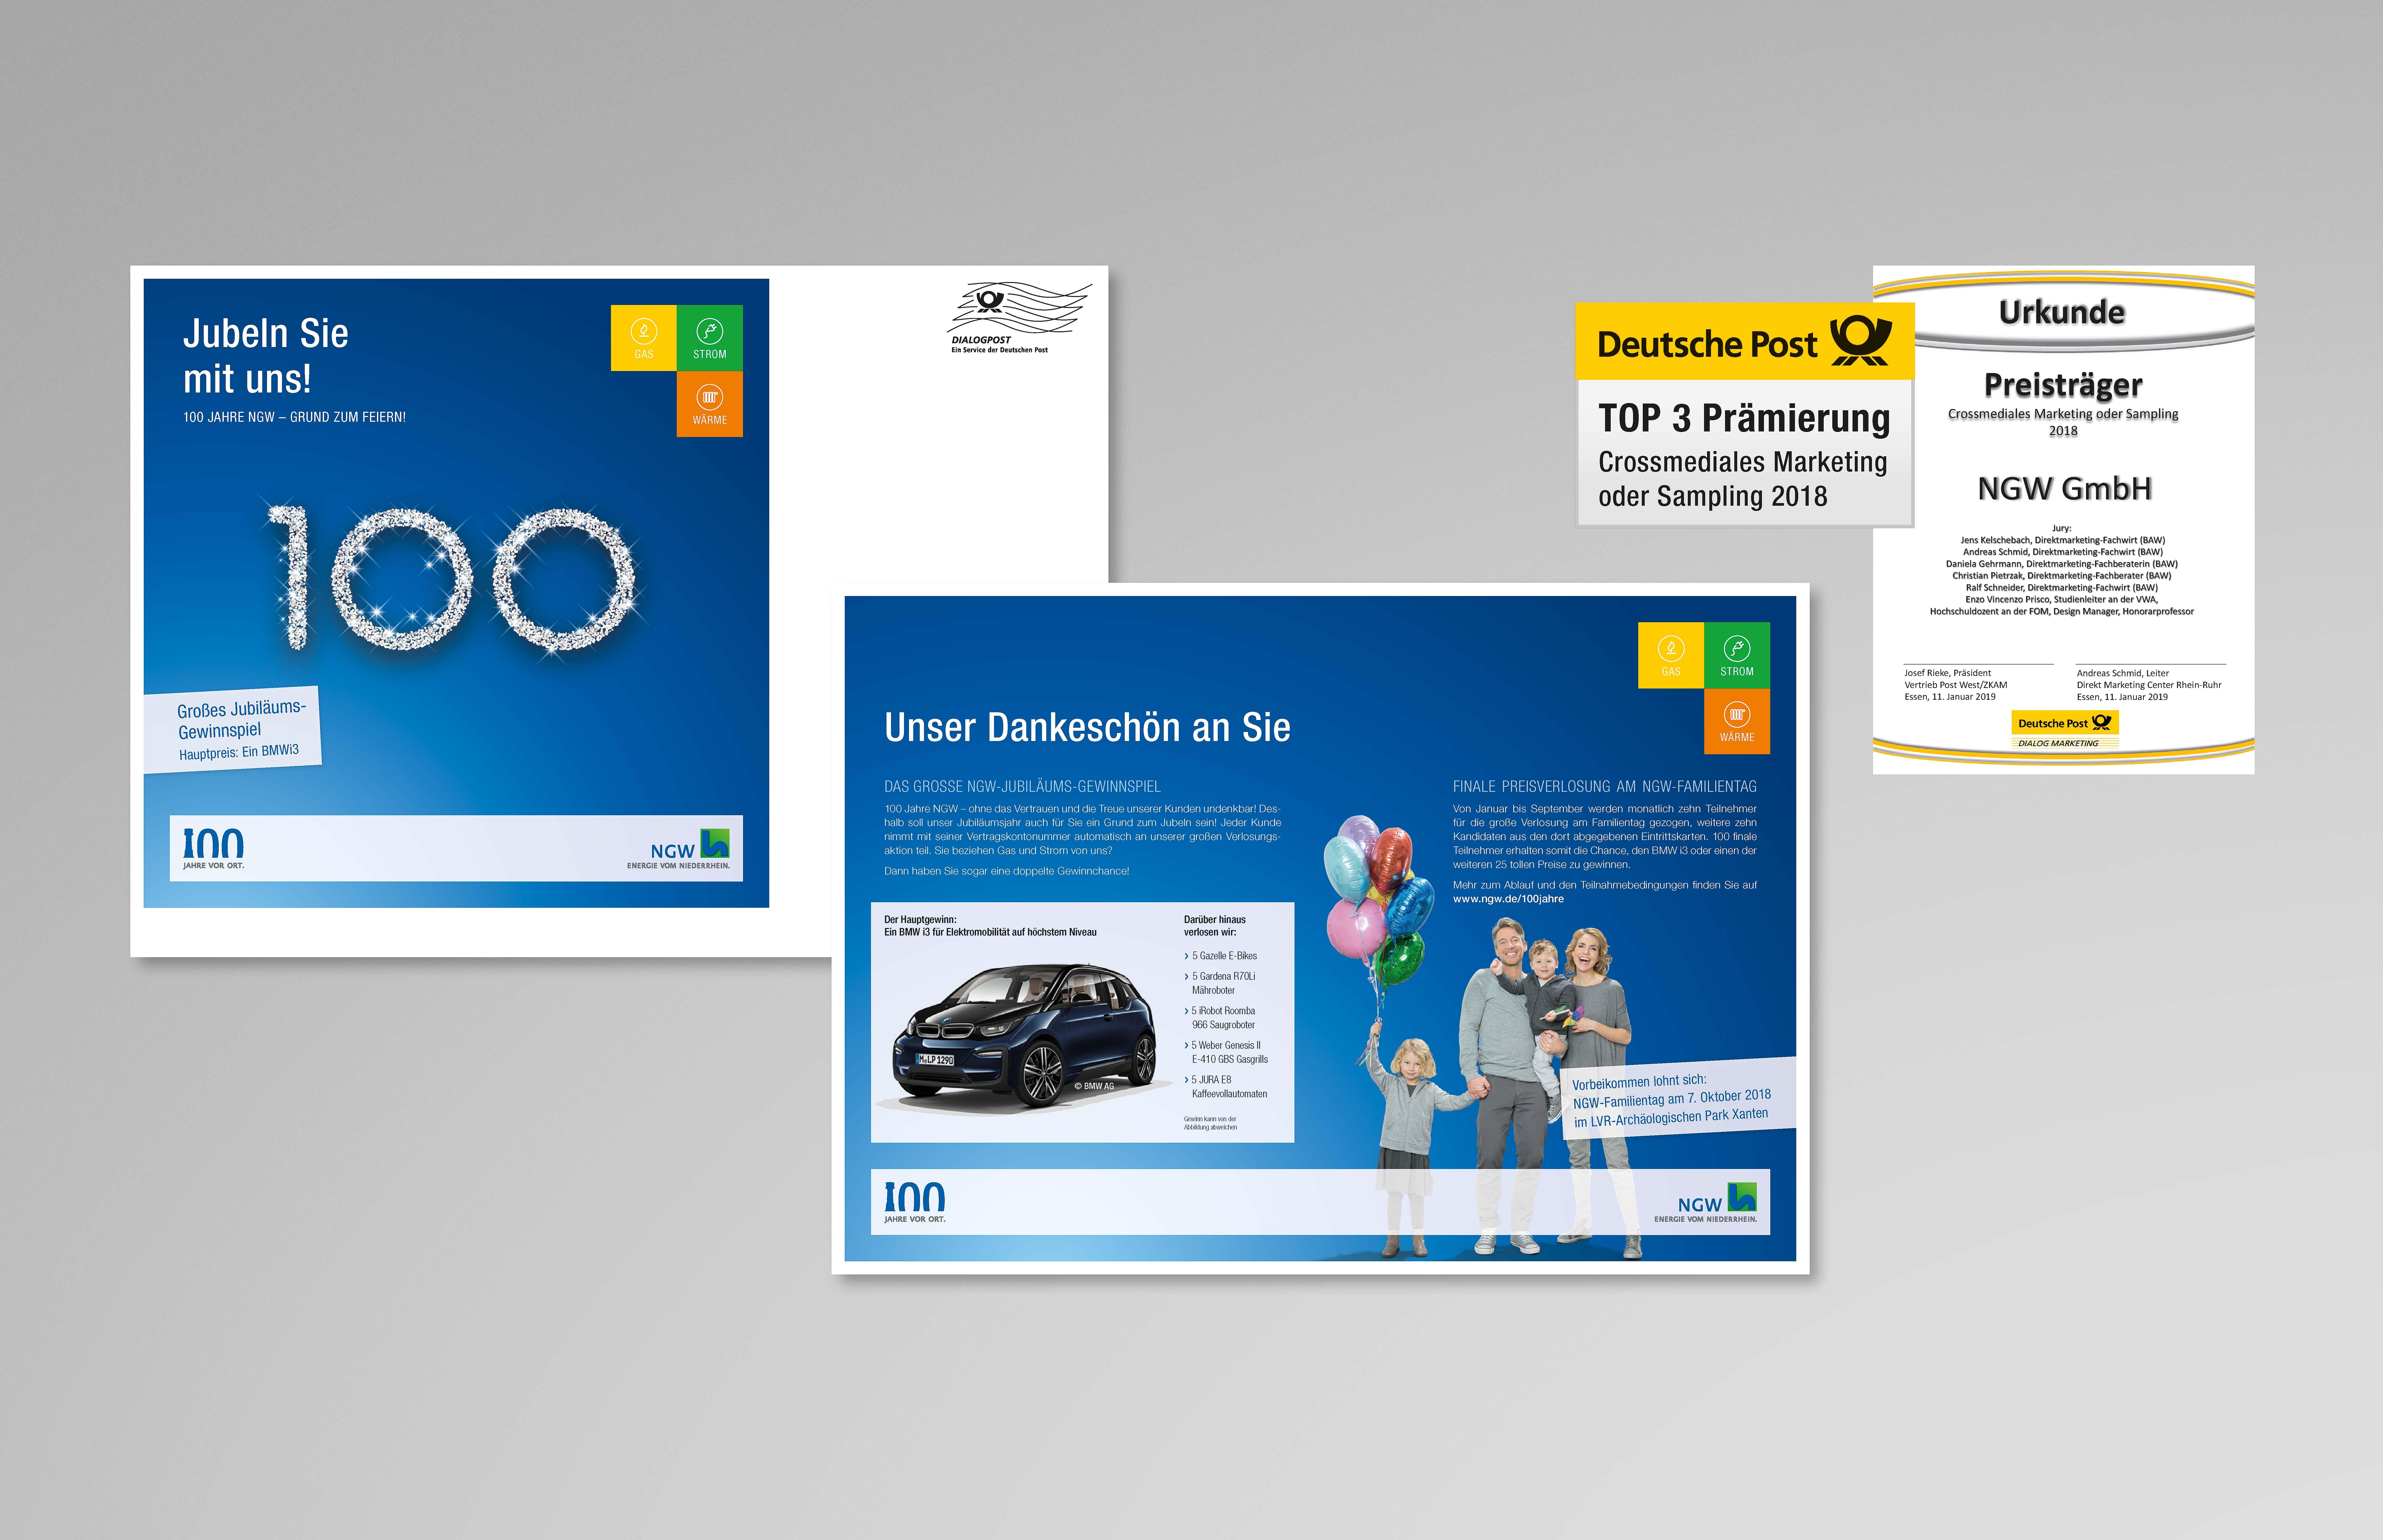 NGW GmbH